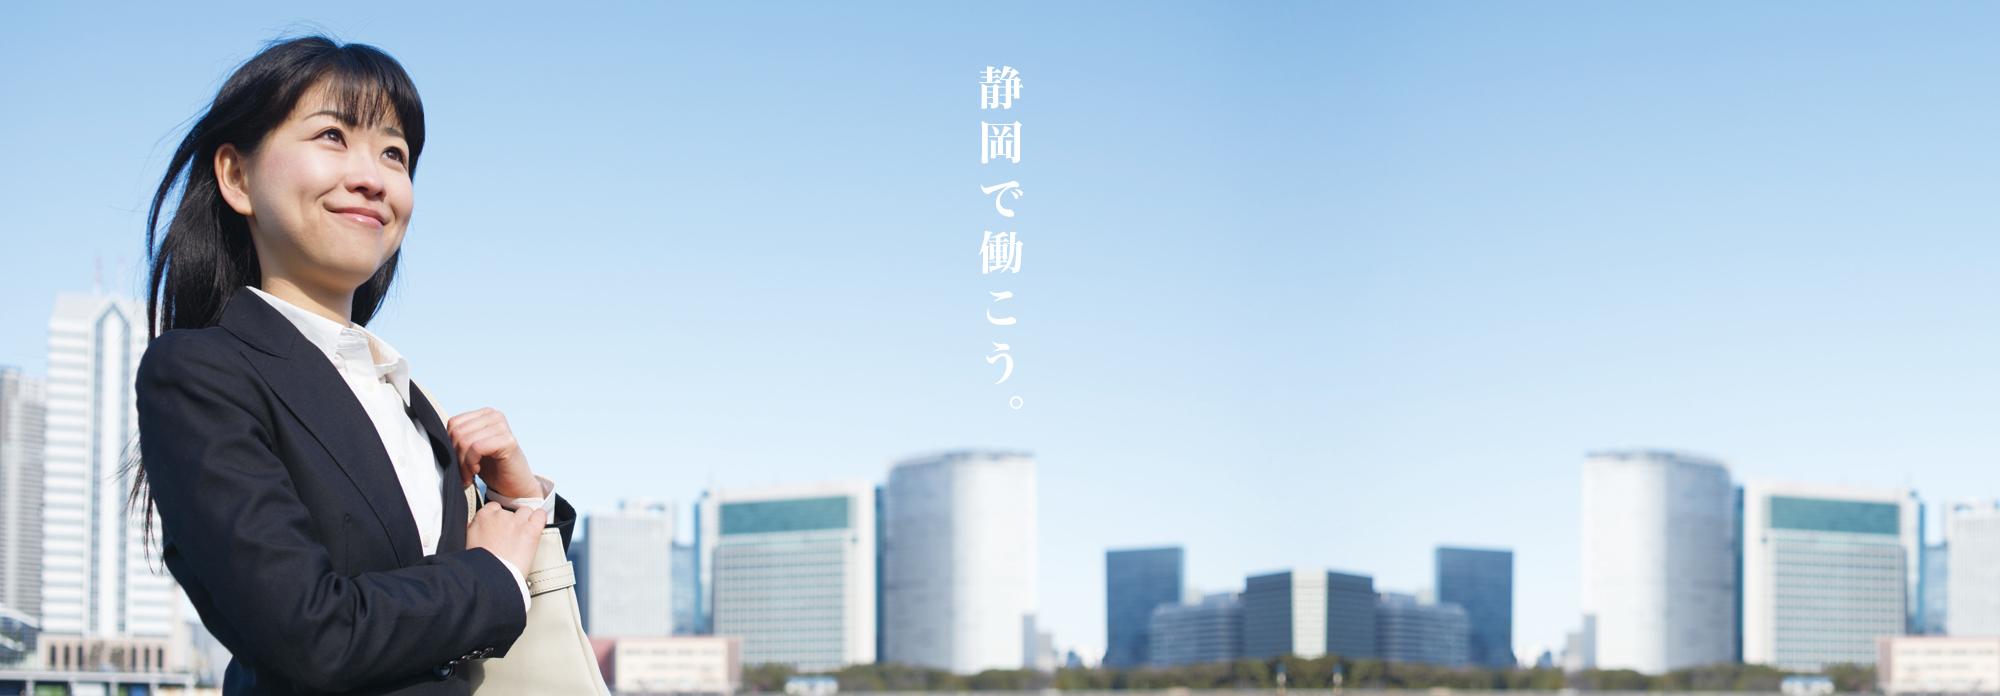 U・Iターン就職ガイダンス 静岡県